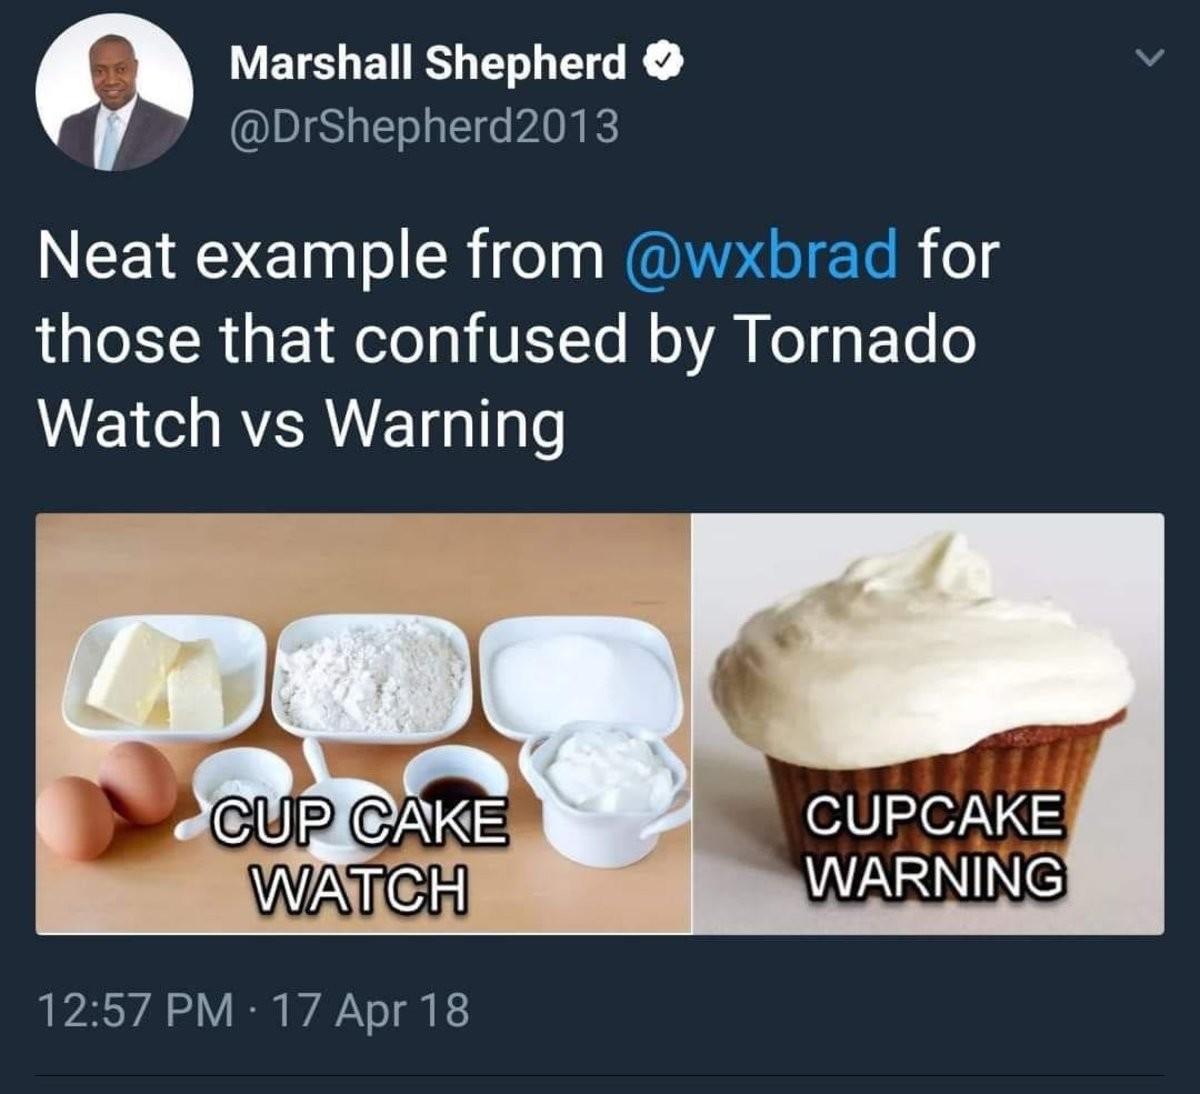 Tornado. .. Ominous with no context.